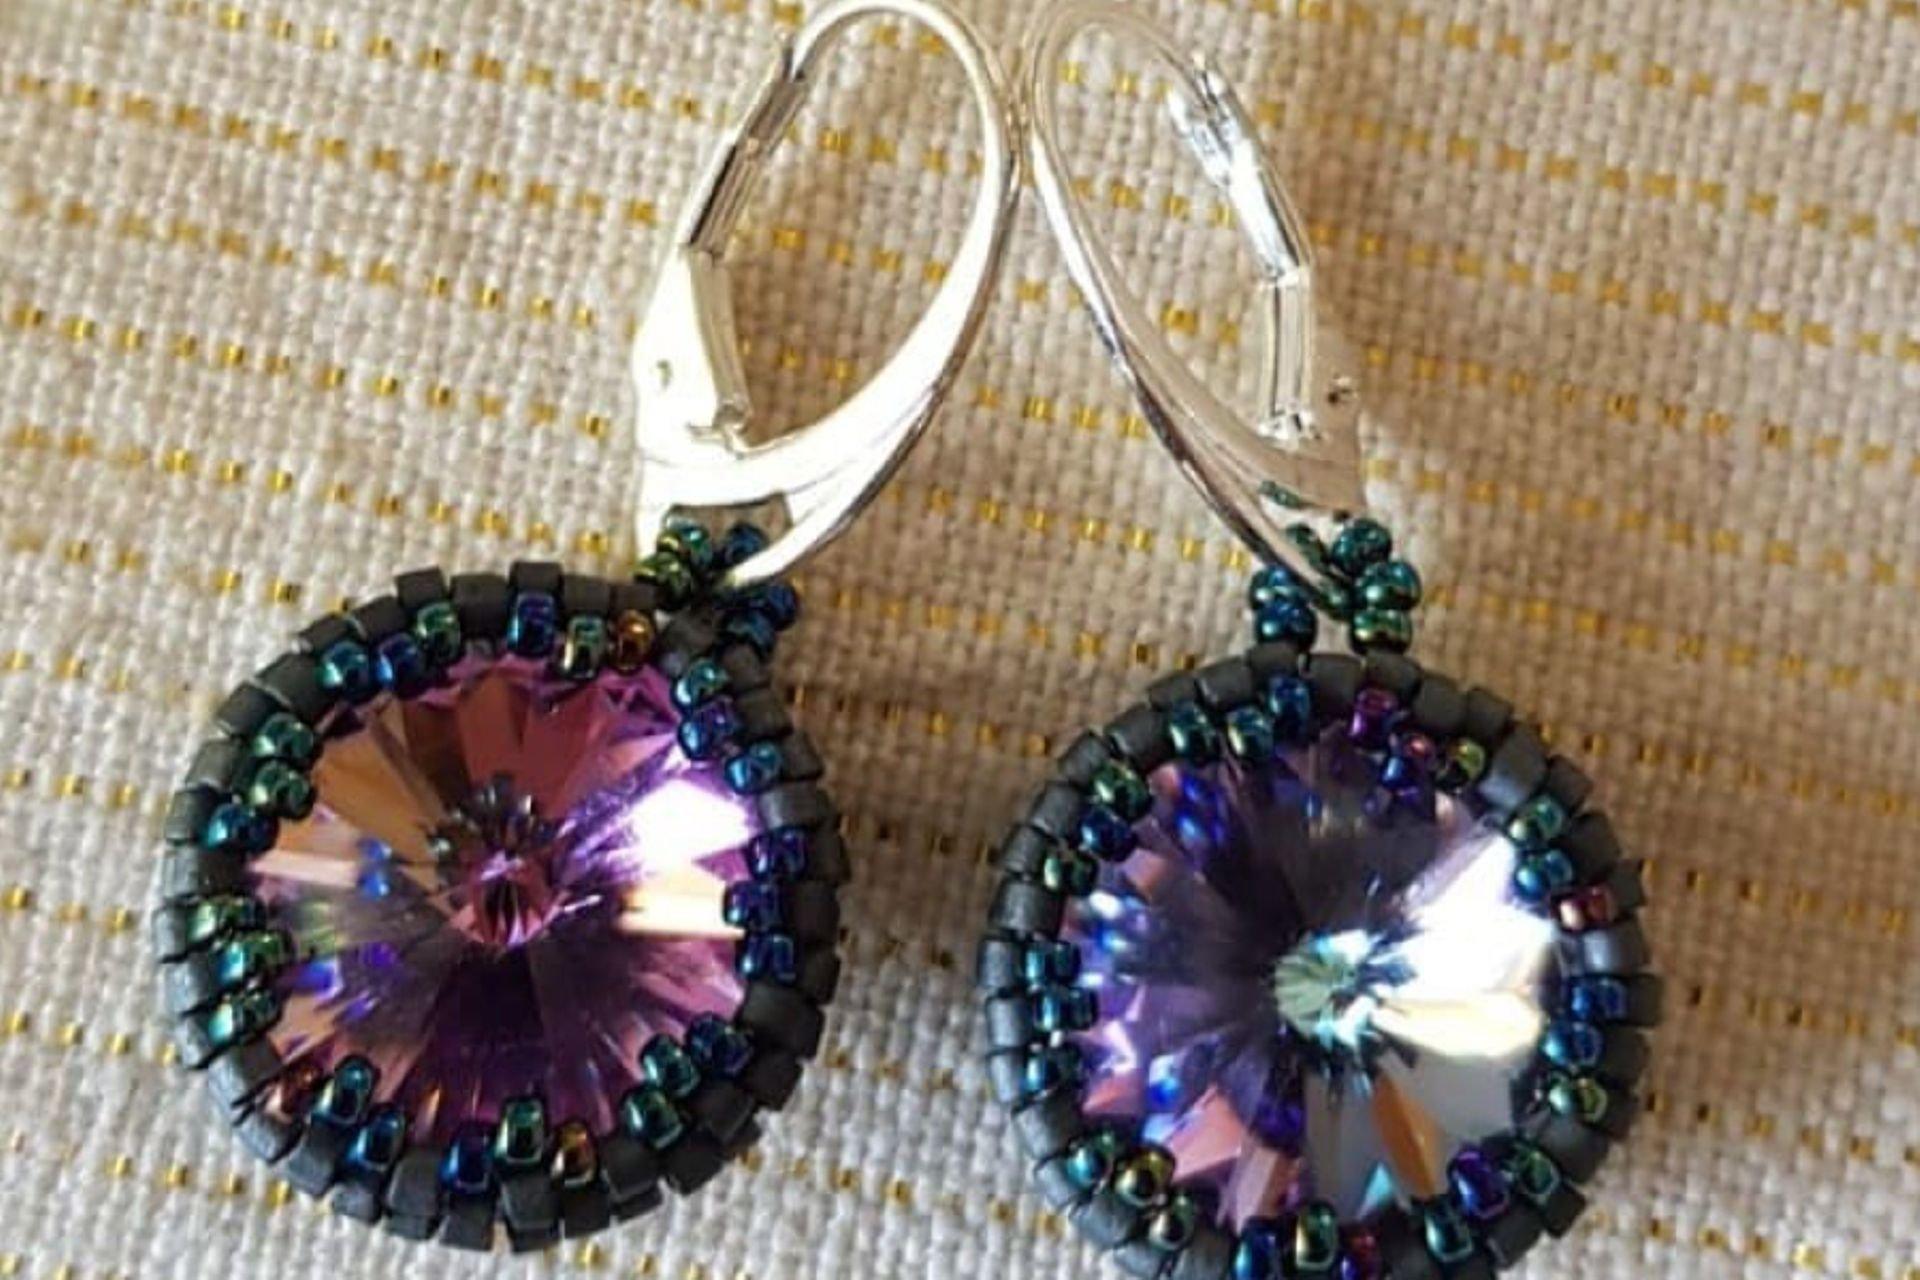 16 lantana beads jewelry designer תְמוּנָה